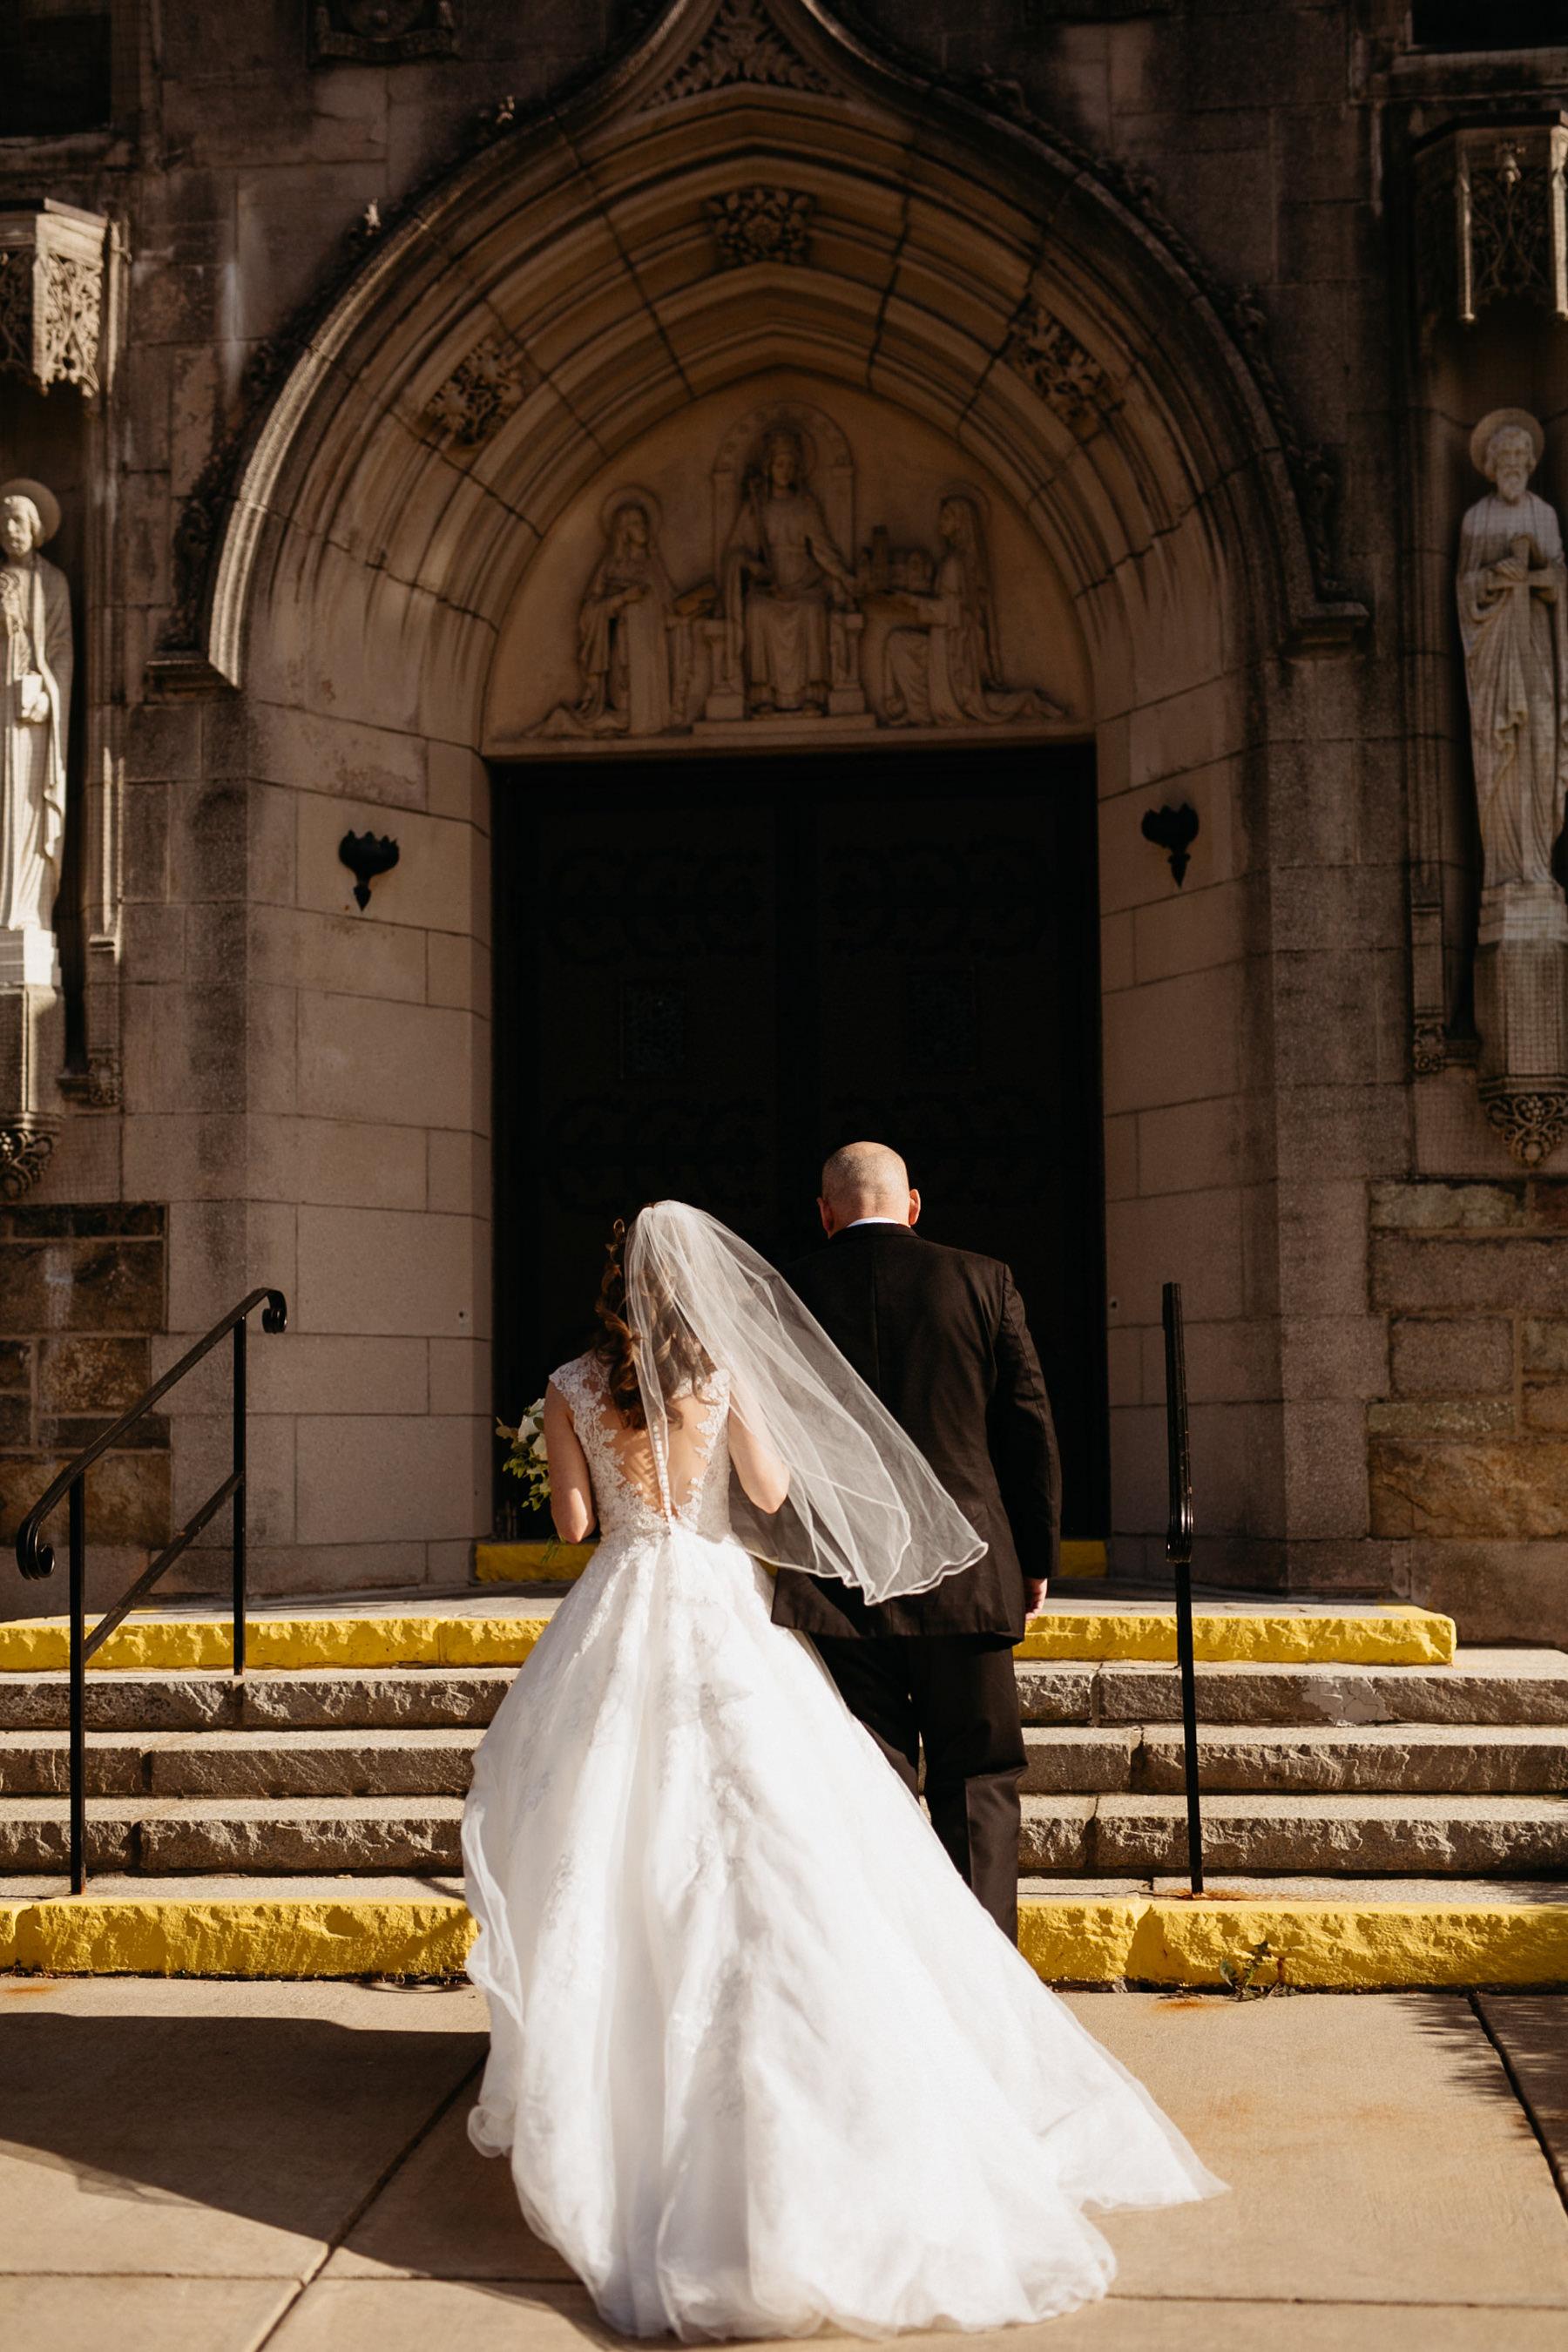 Quincy Ma Massachusetts Wedding Dedham Boston Granie Links Wedding New England Catholic Cathedral Liz Osban Photography 31.jpg